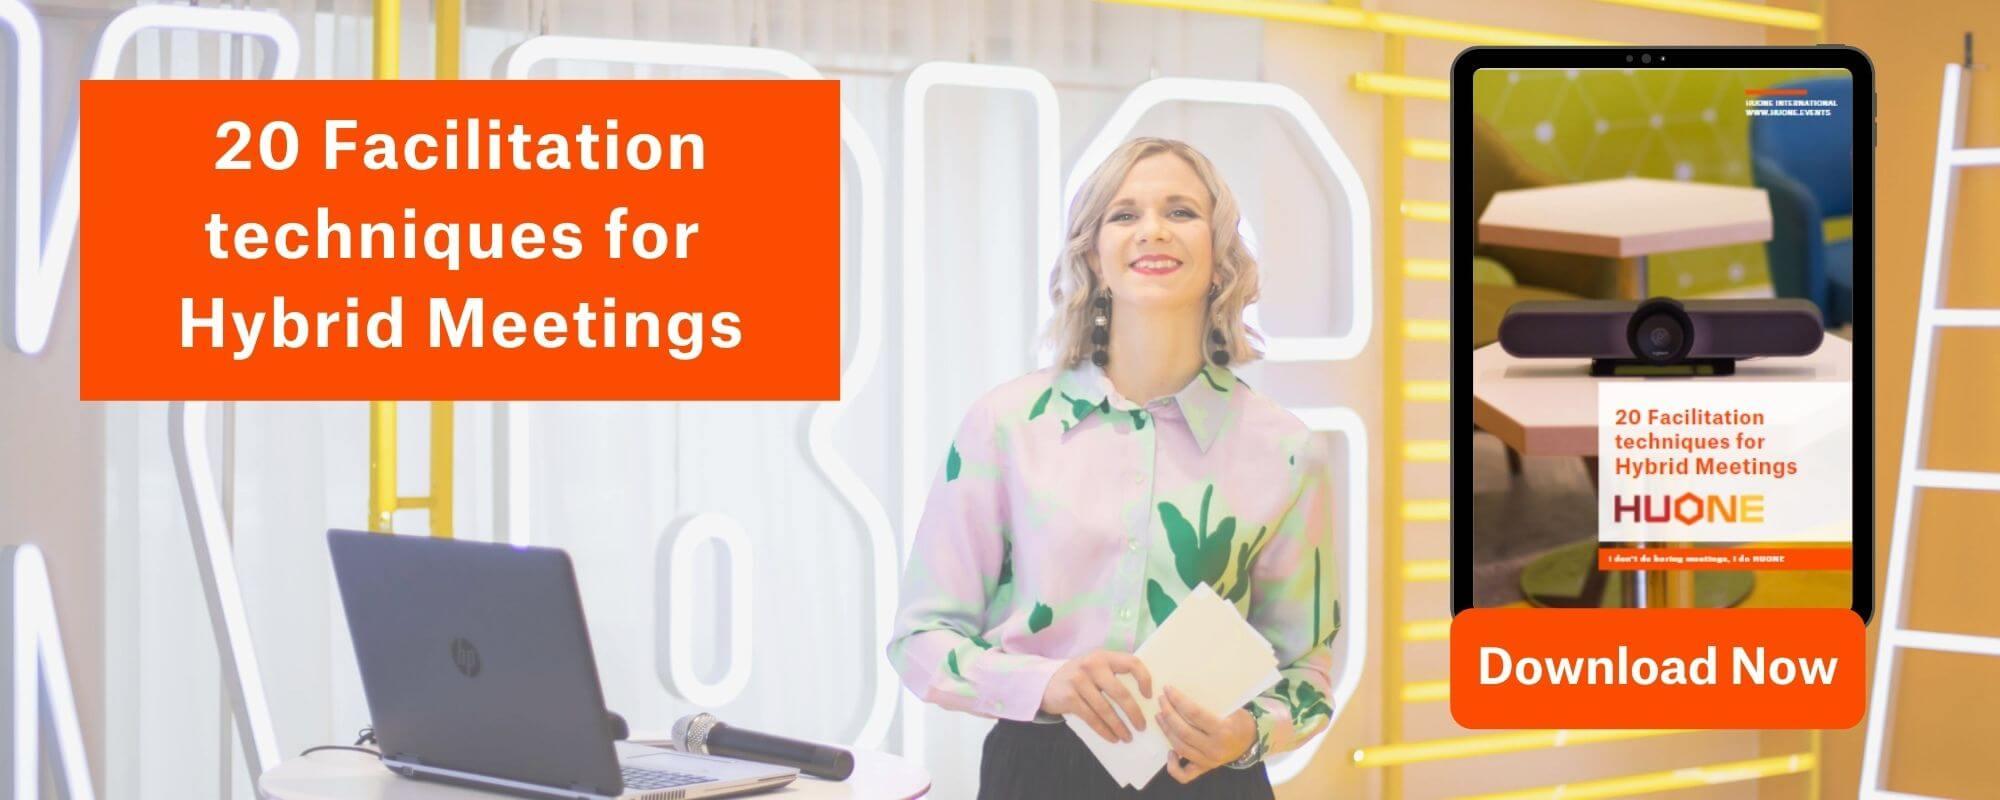 Hybrid meeting facilitation_Ebook download